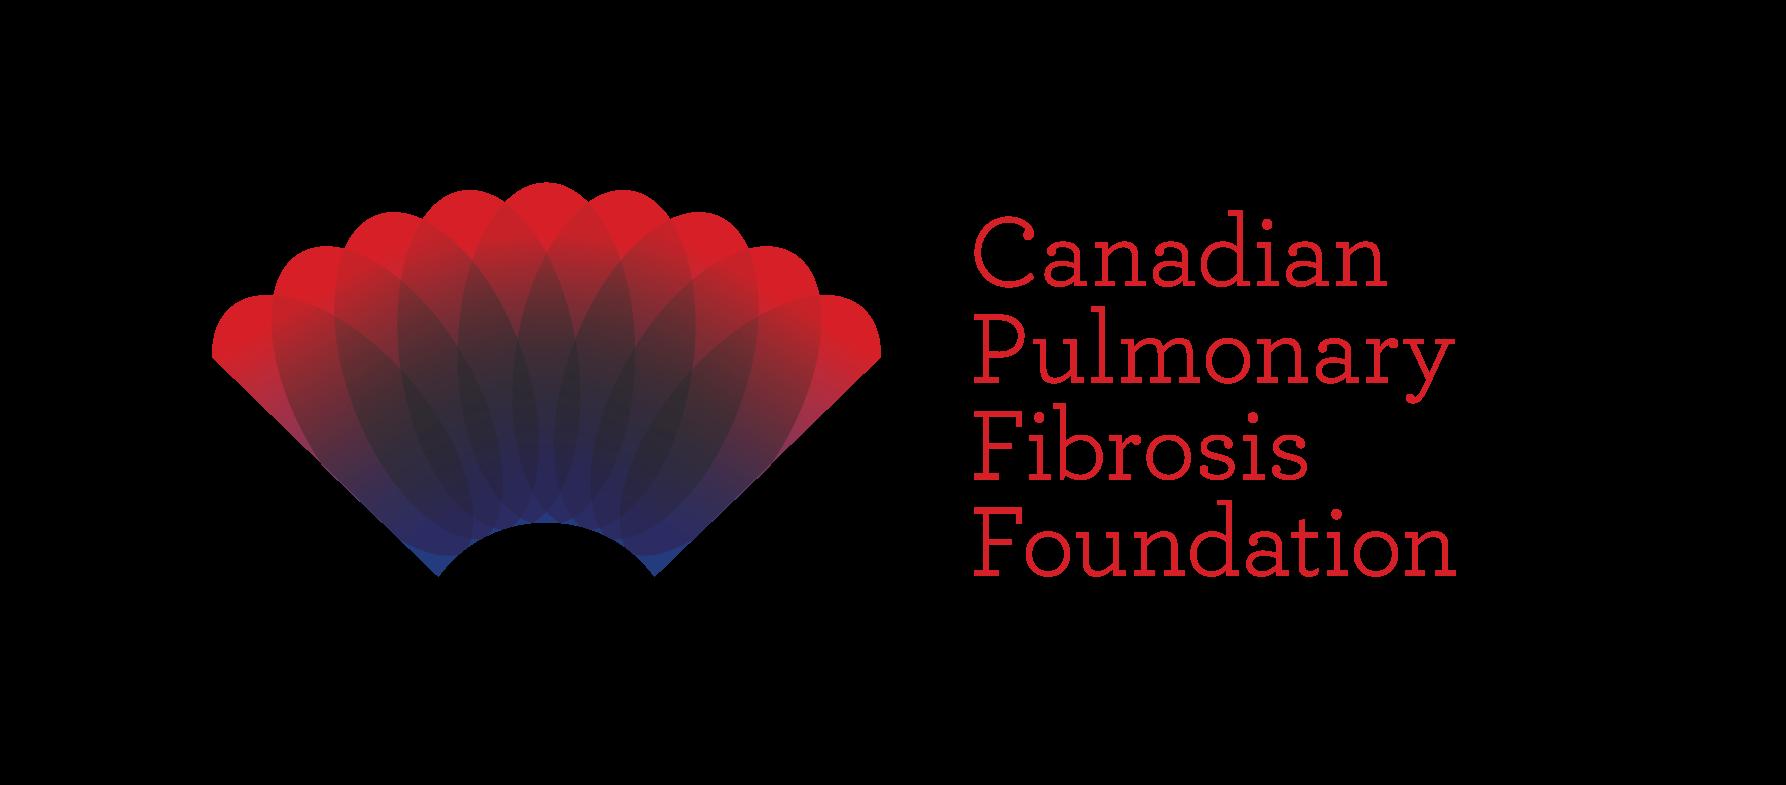 Canadian Pulmonary<br>Fibrosis Foundation (CA)